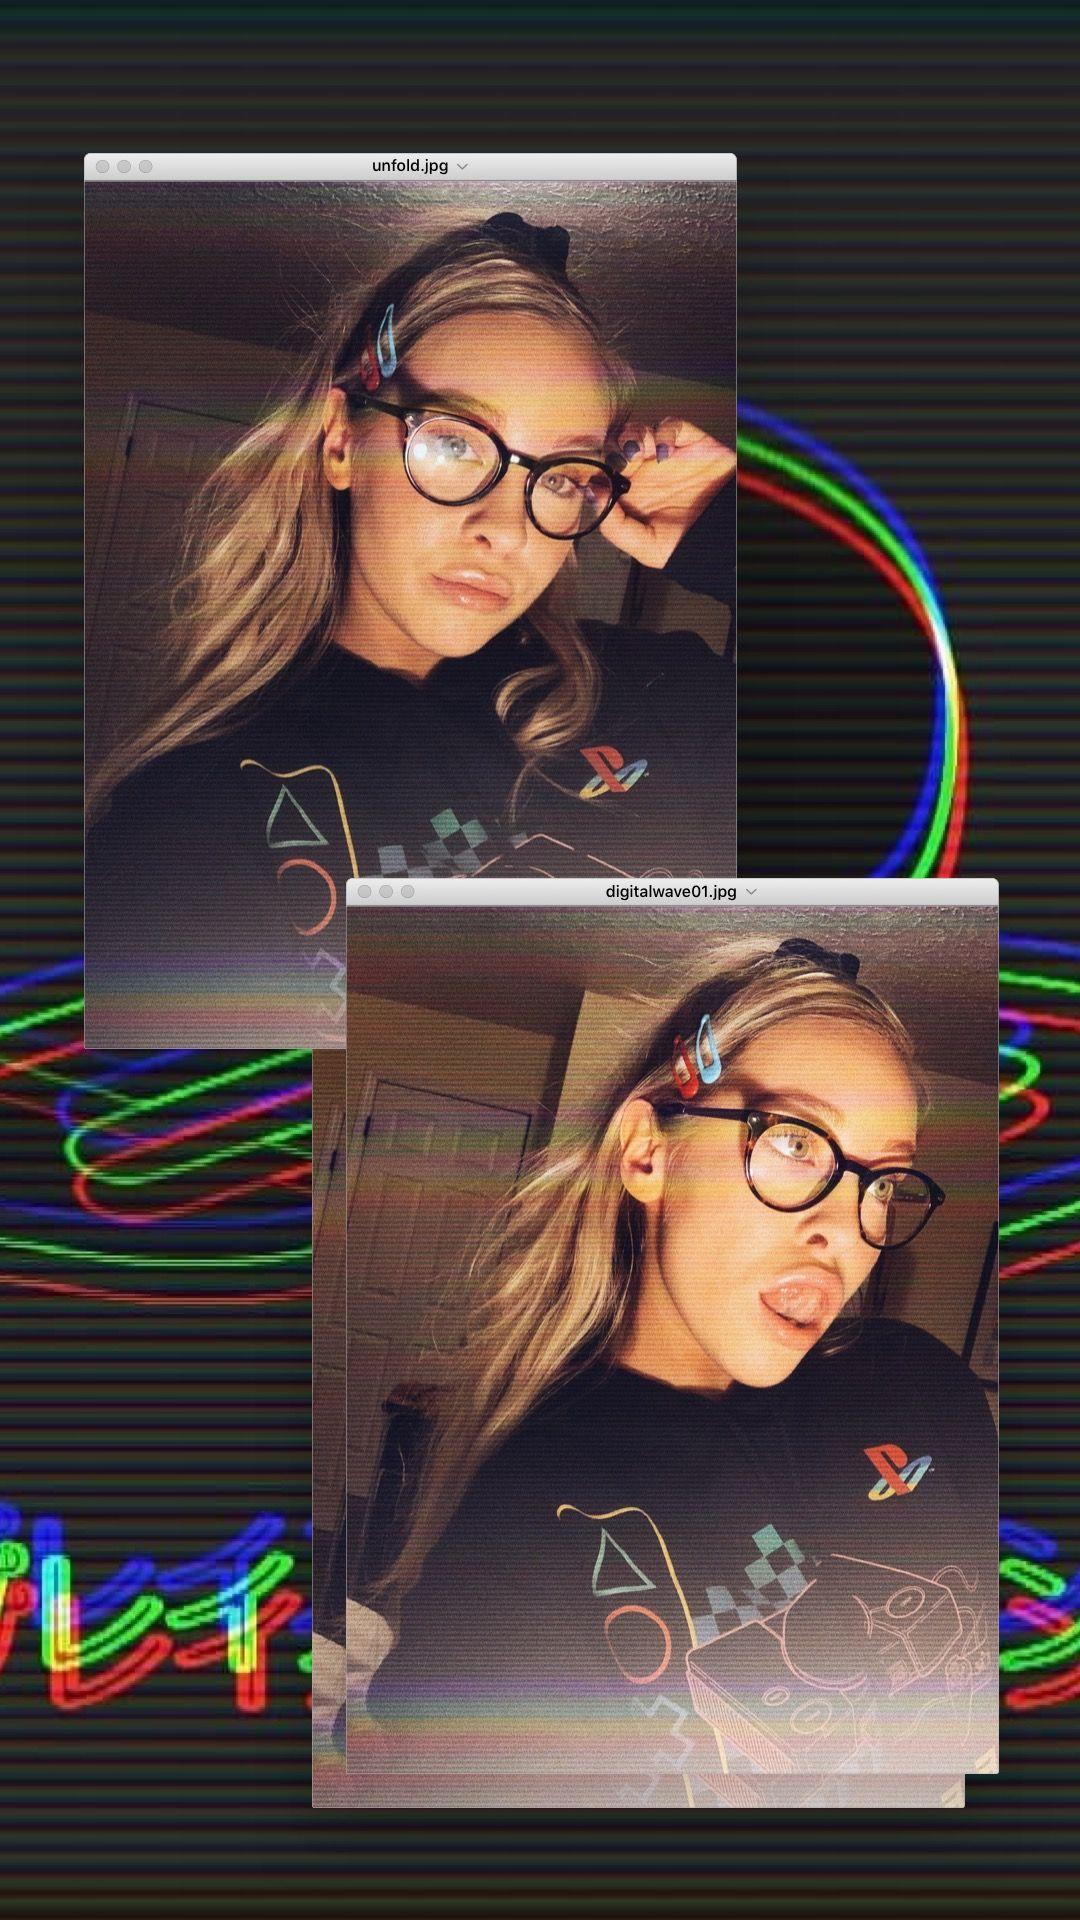 Cute Hair Clips Aesthetic Colourful Outfits Hair Clips Gamer Girl